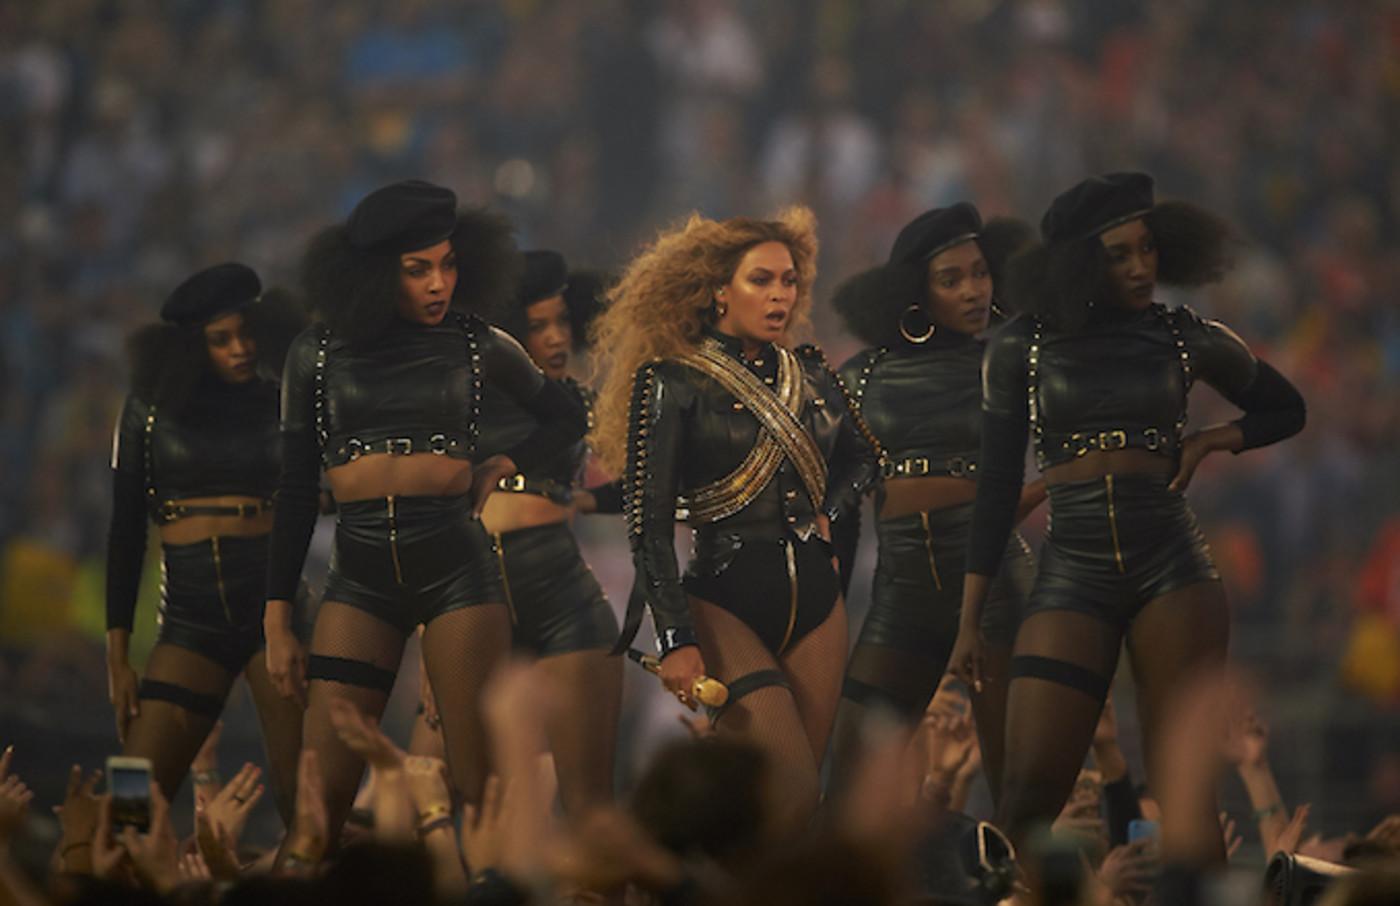 Beyonce Coachella Rehearsal 11 Hours